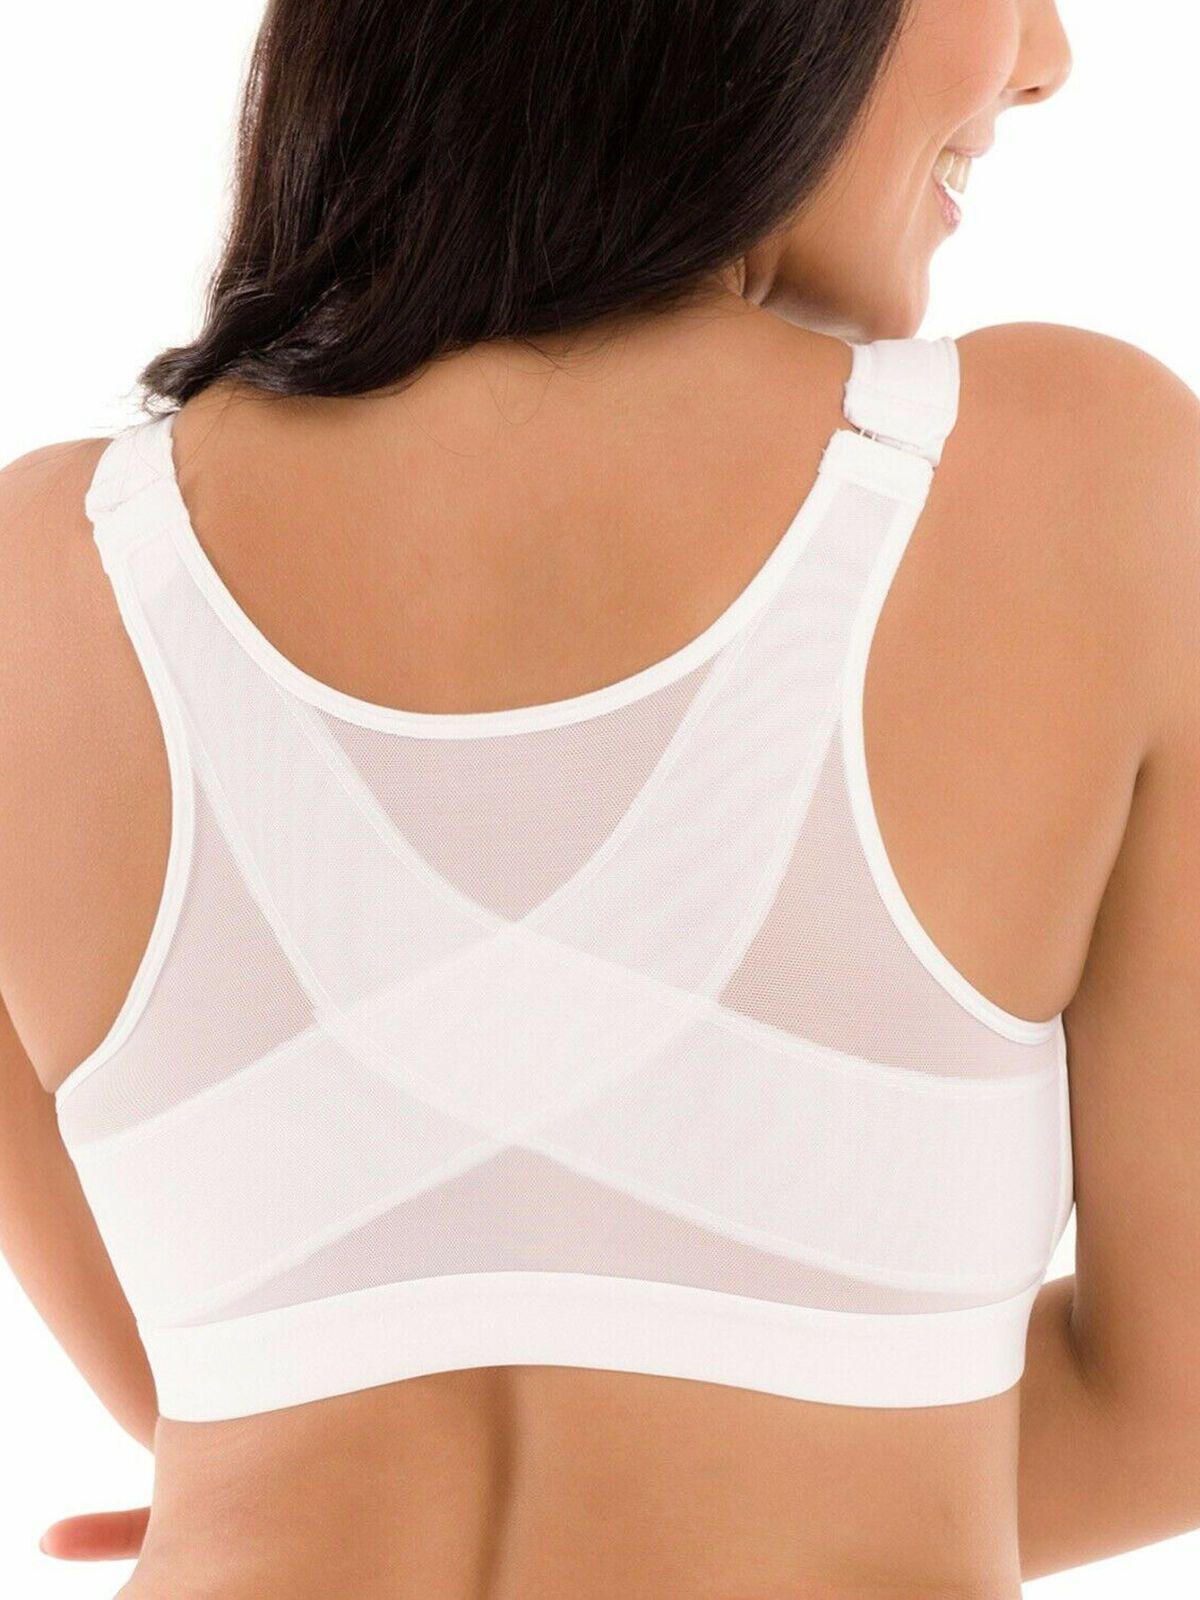 Women/'s Posture Corrector Bra Wireless Back Support Lift Up Front Closure Bra